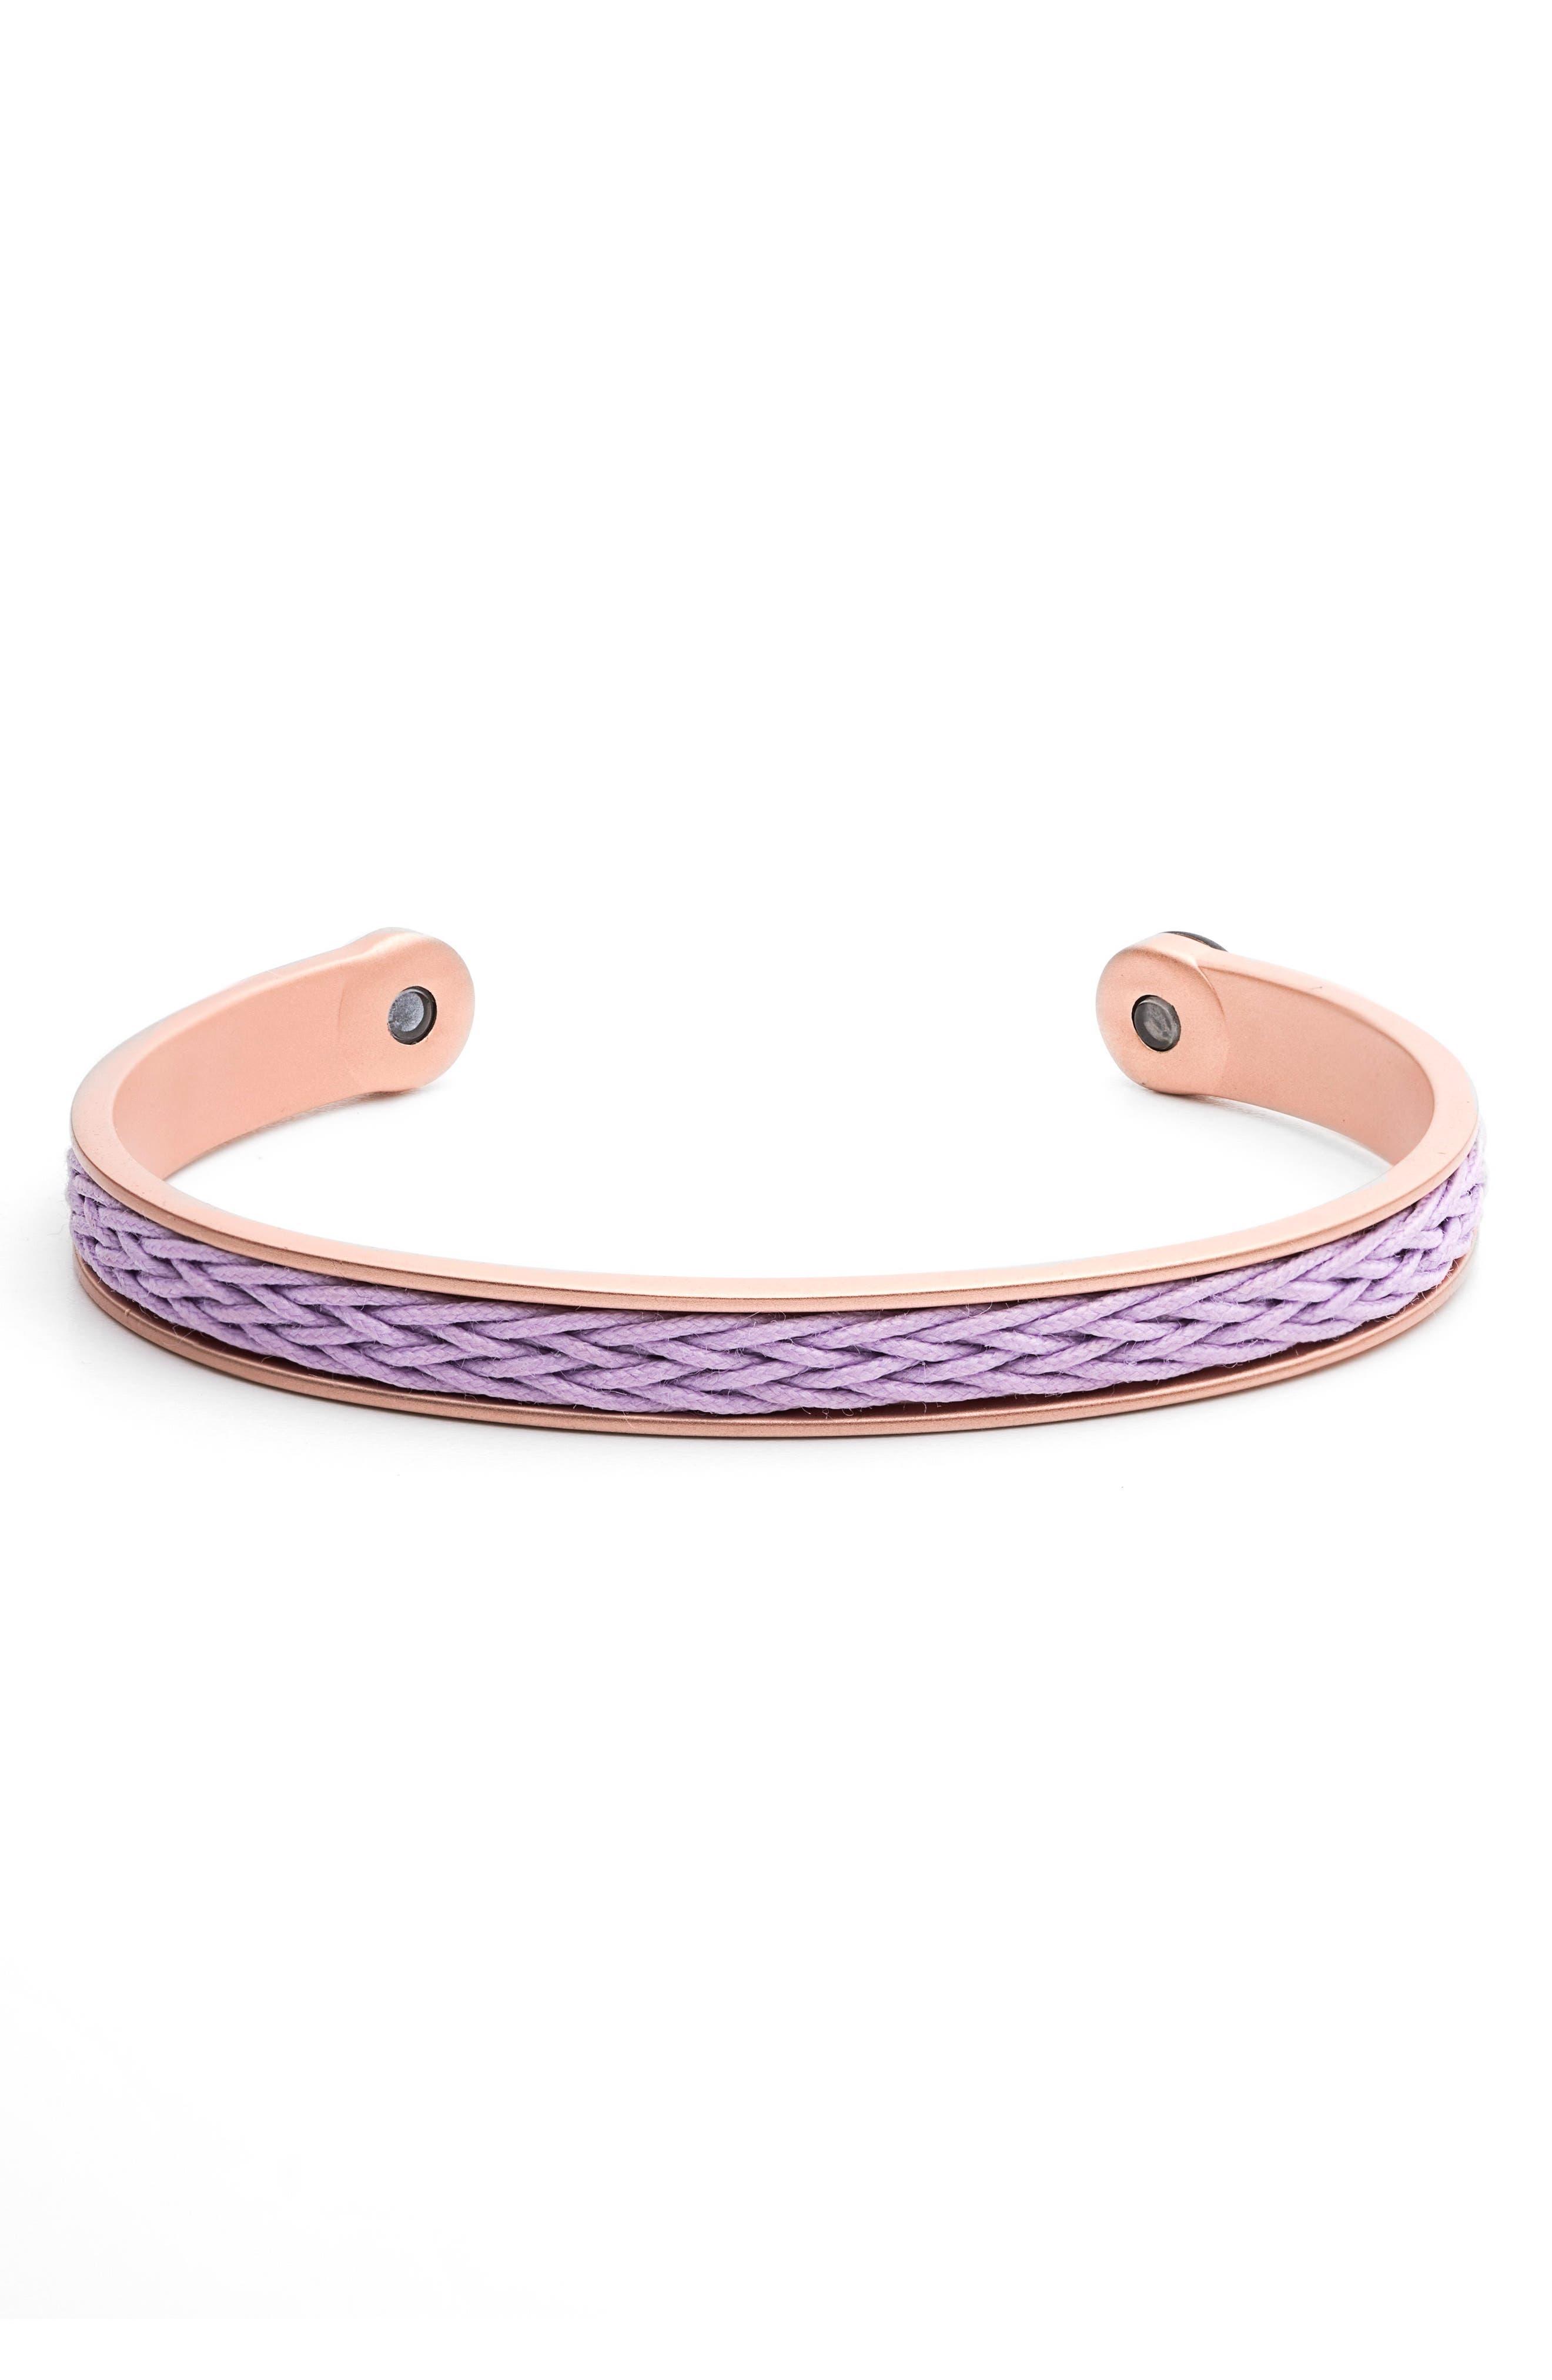 Lokai Braided Cuff Bracelet